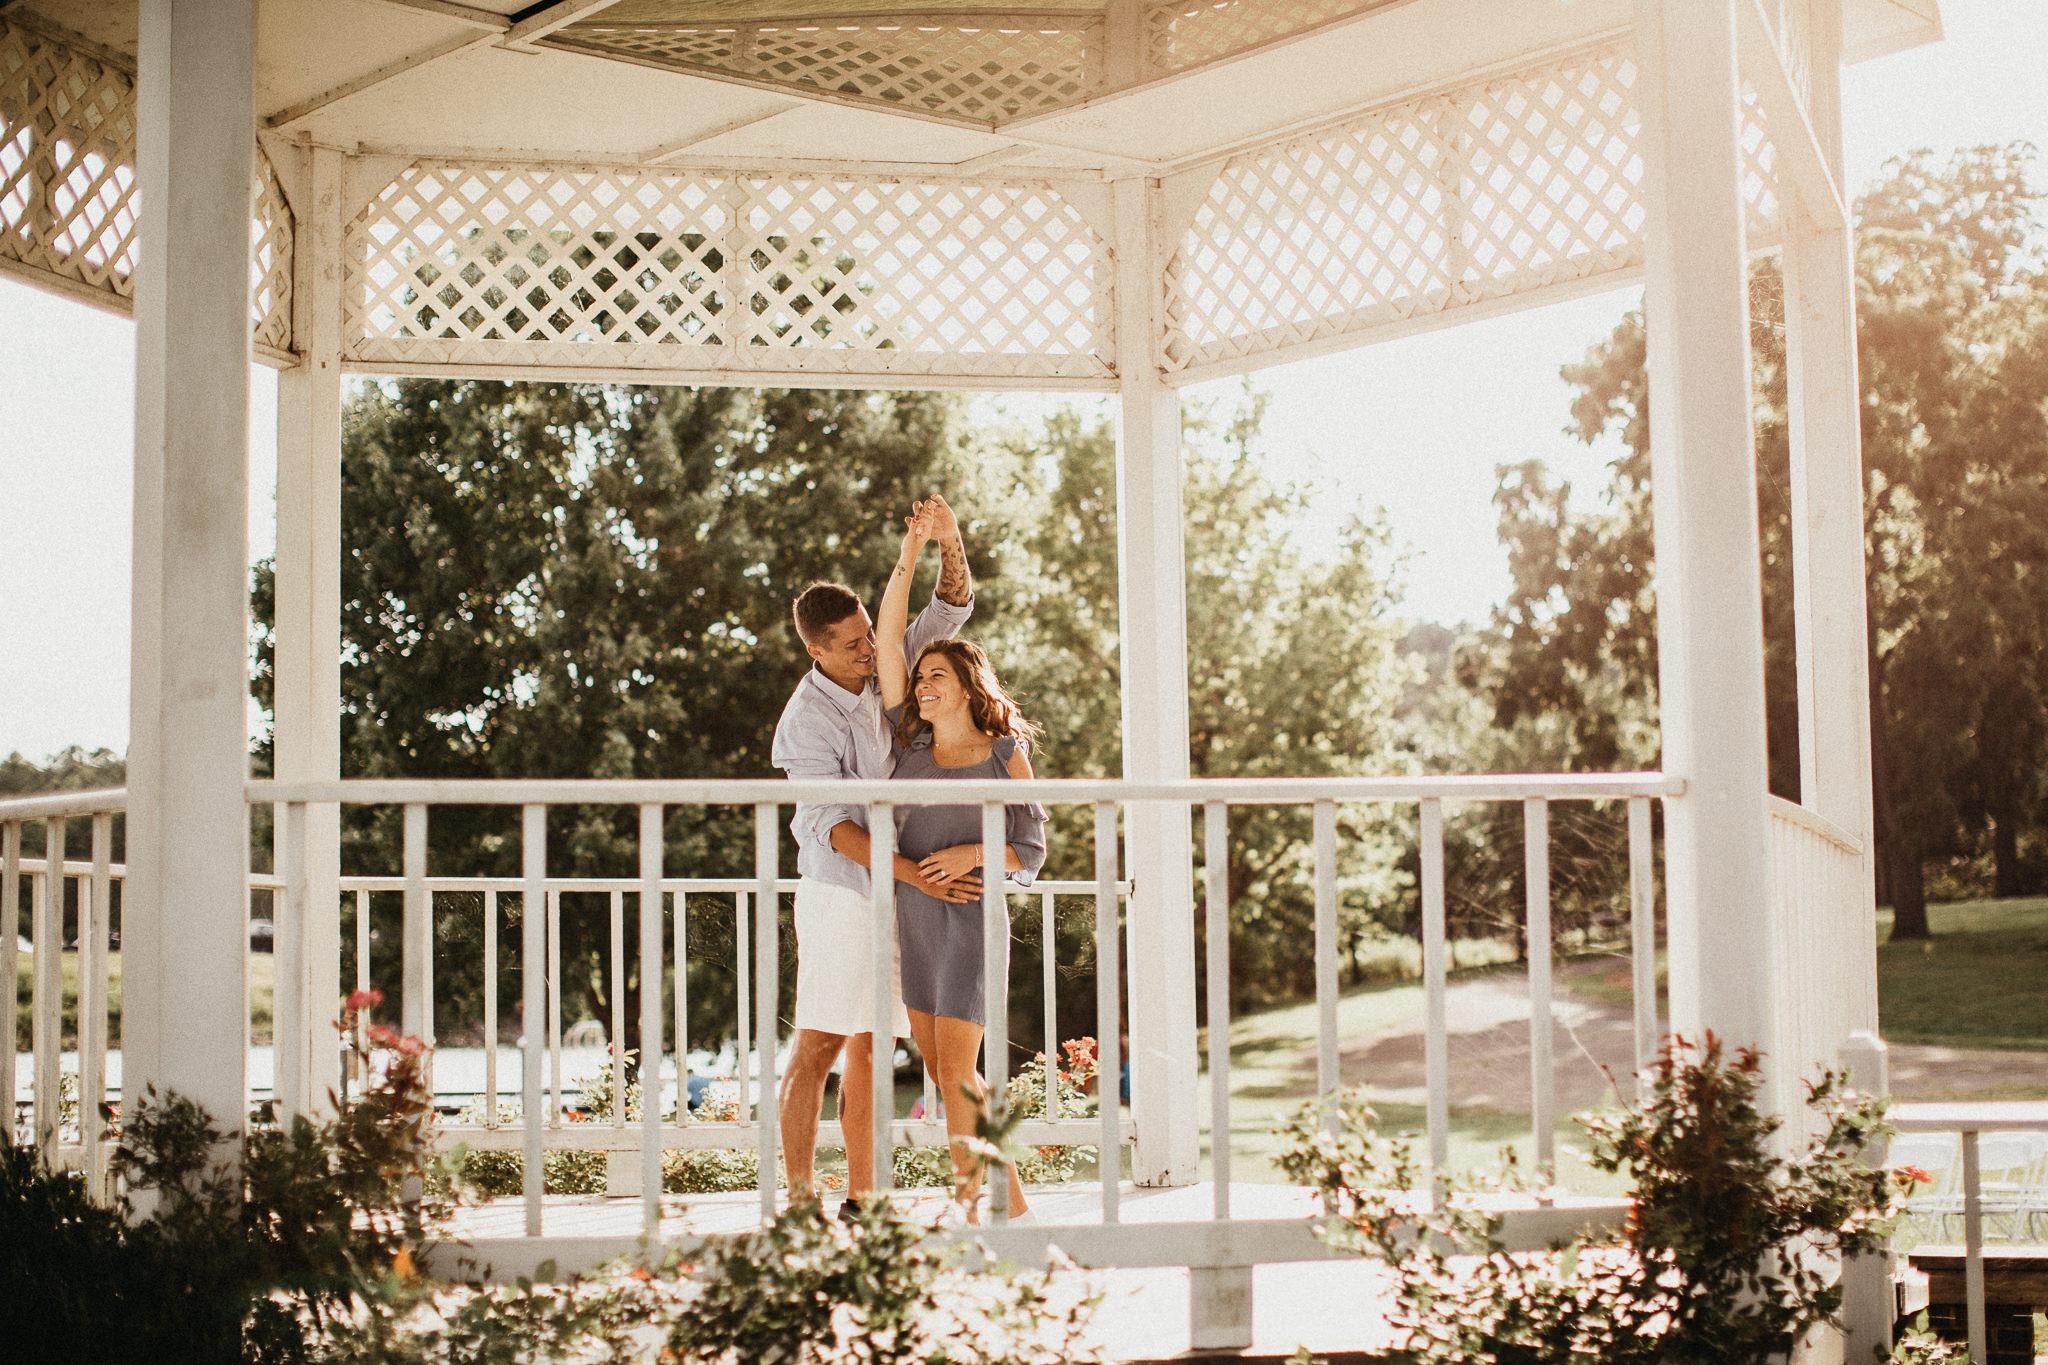 Claytor Lake State Park - Engagement portraits - Virginia wedding photographer - Pat Cori Photography-16.jpg